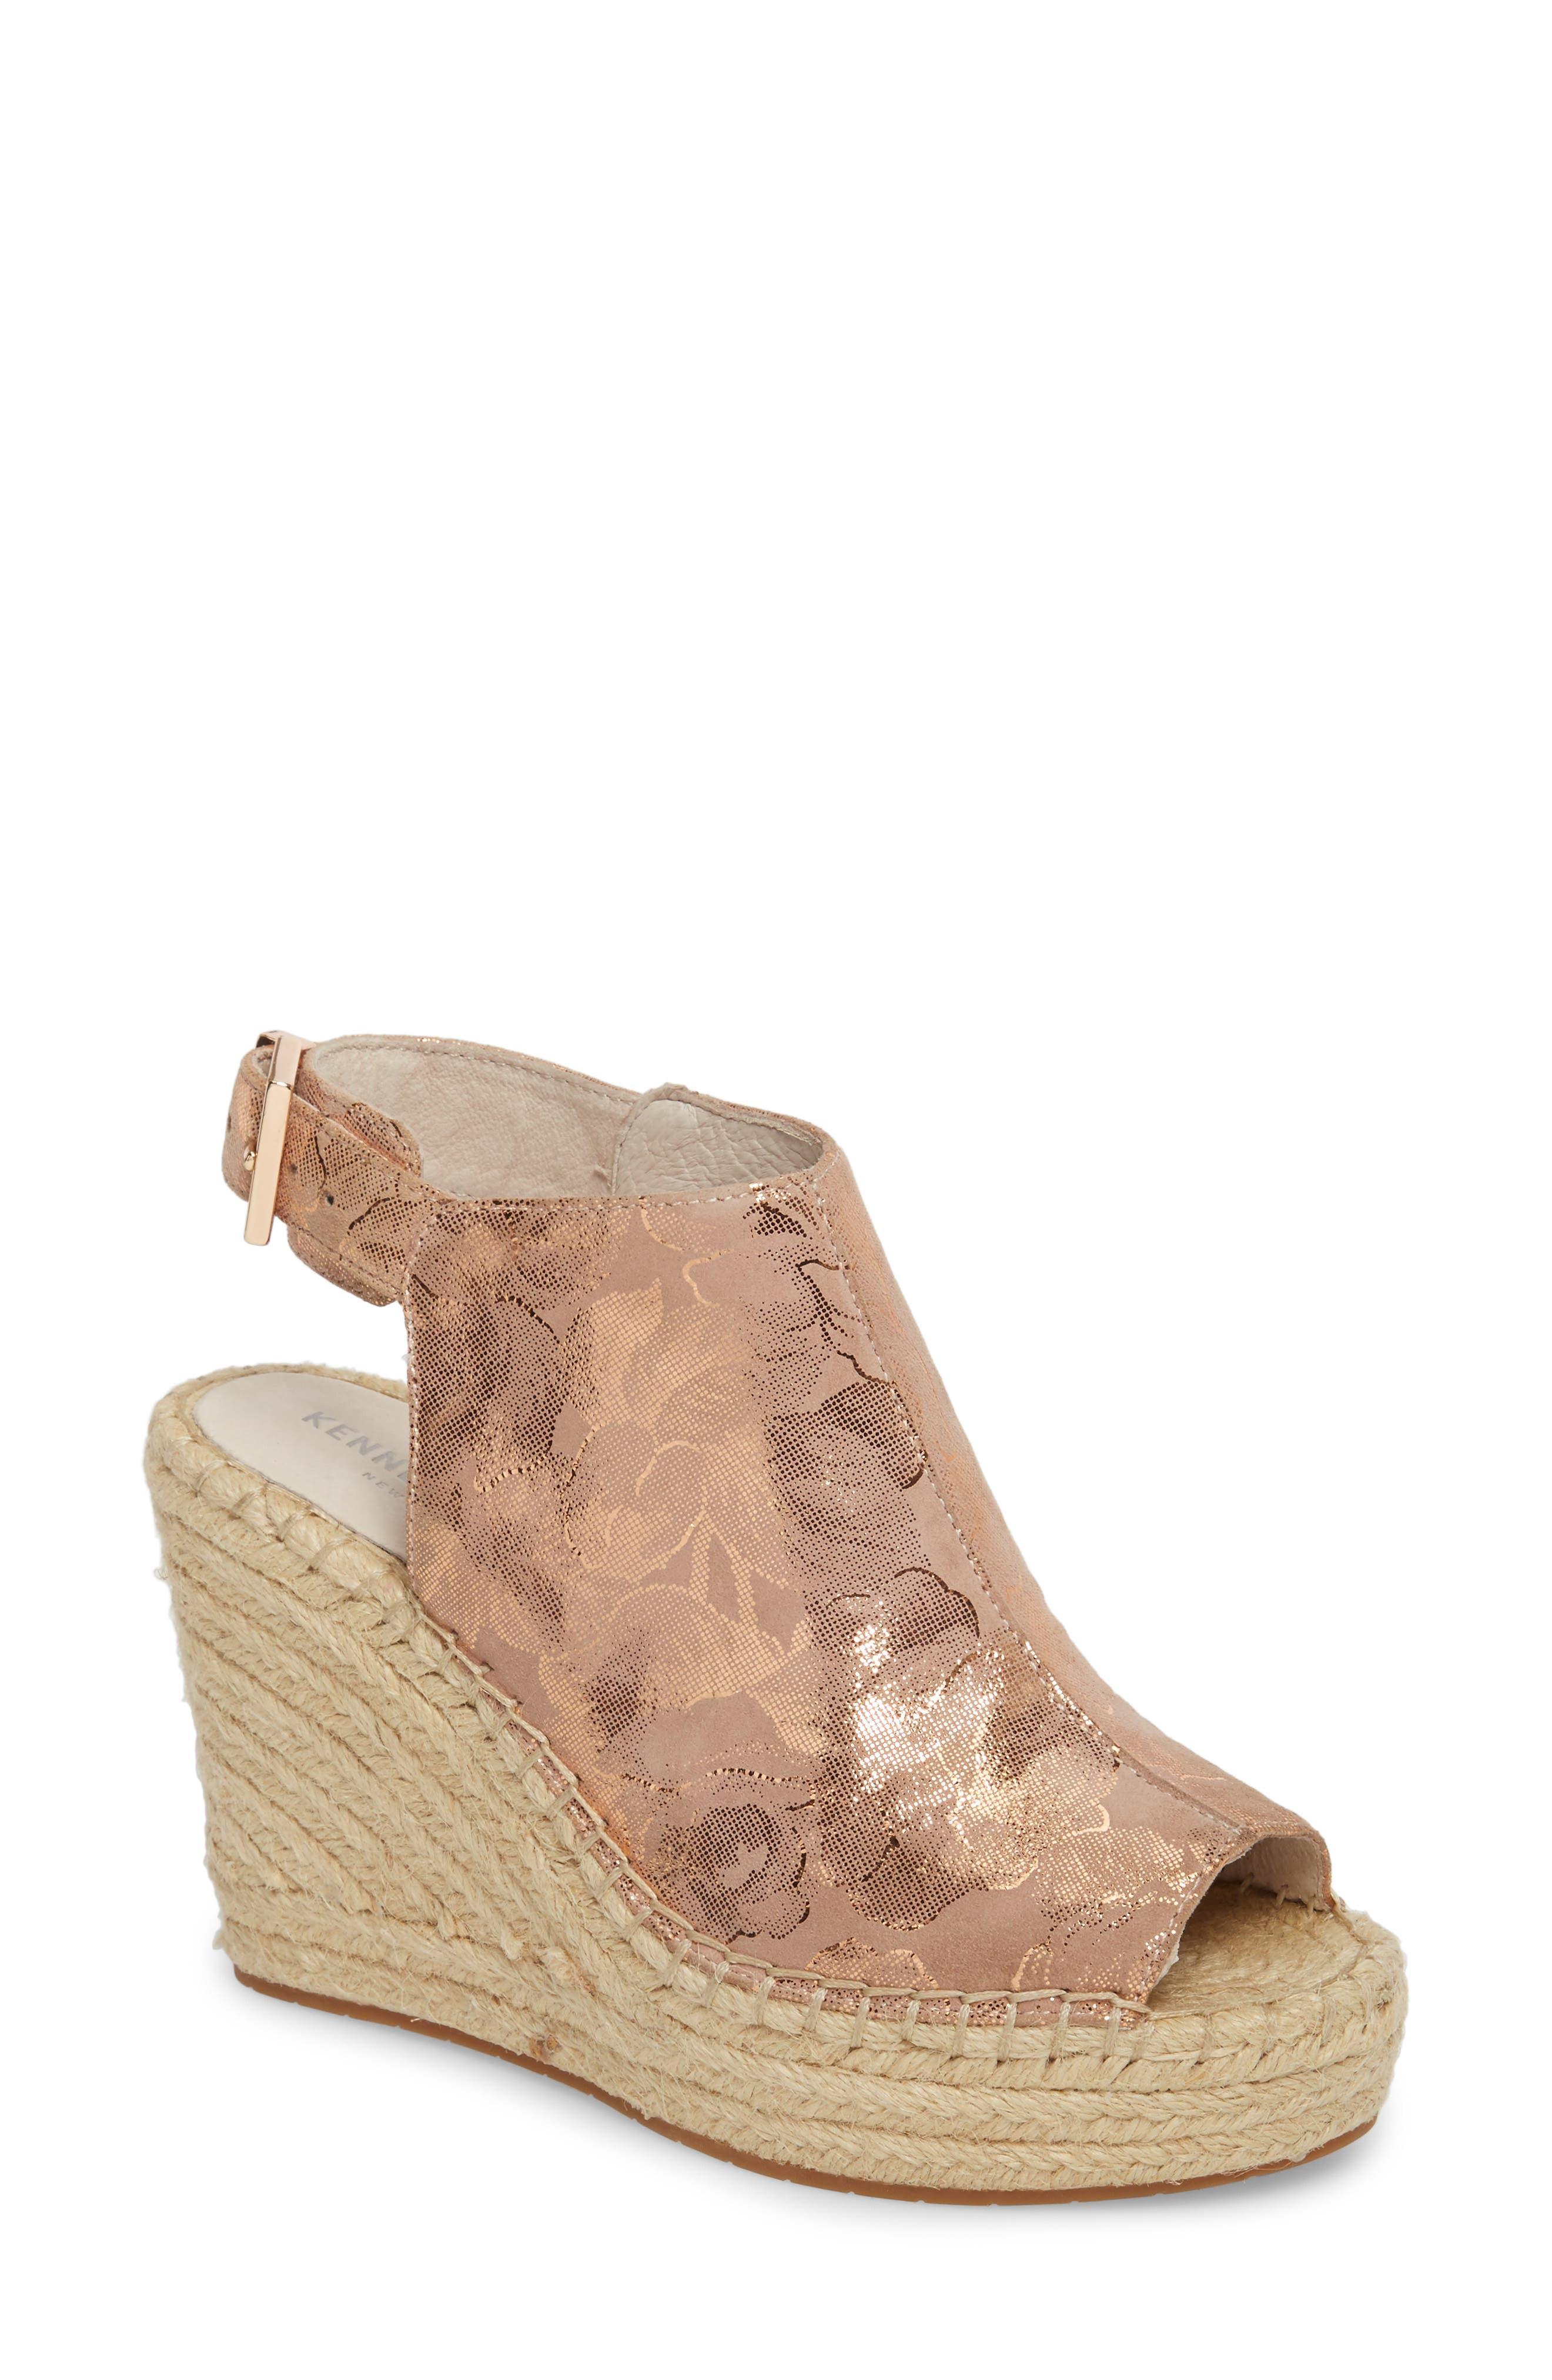 Main Image - Kenneth Cole New York 'Olivia' Wedge Sandal (Women)